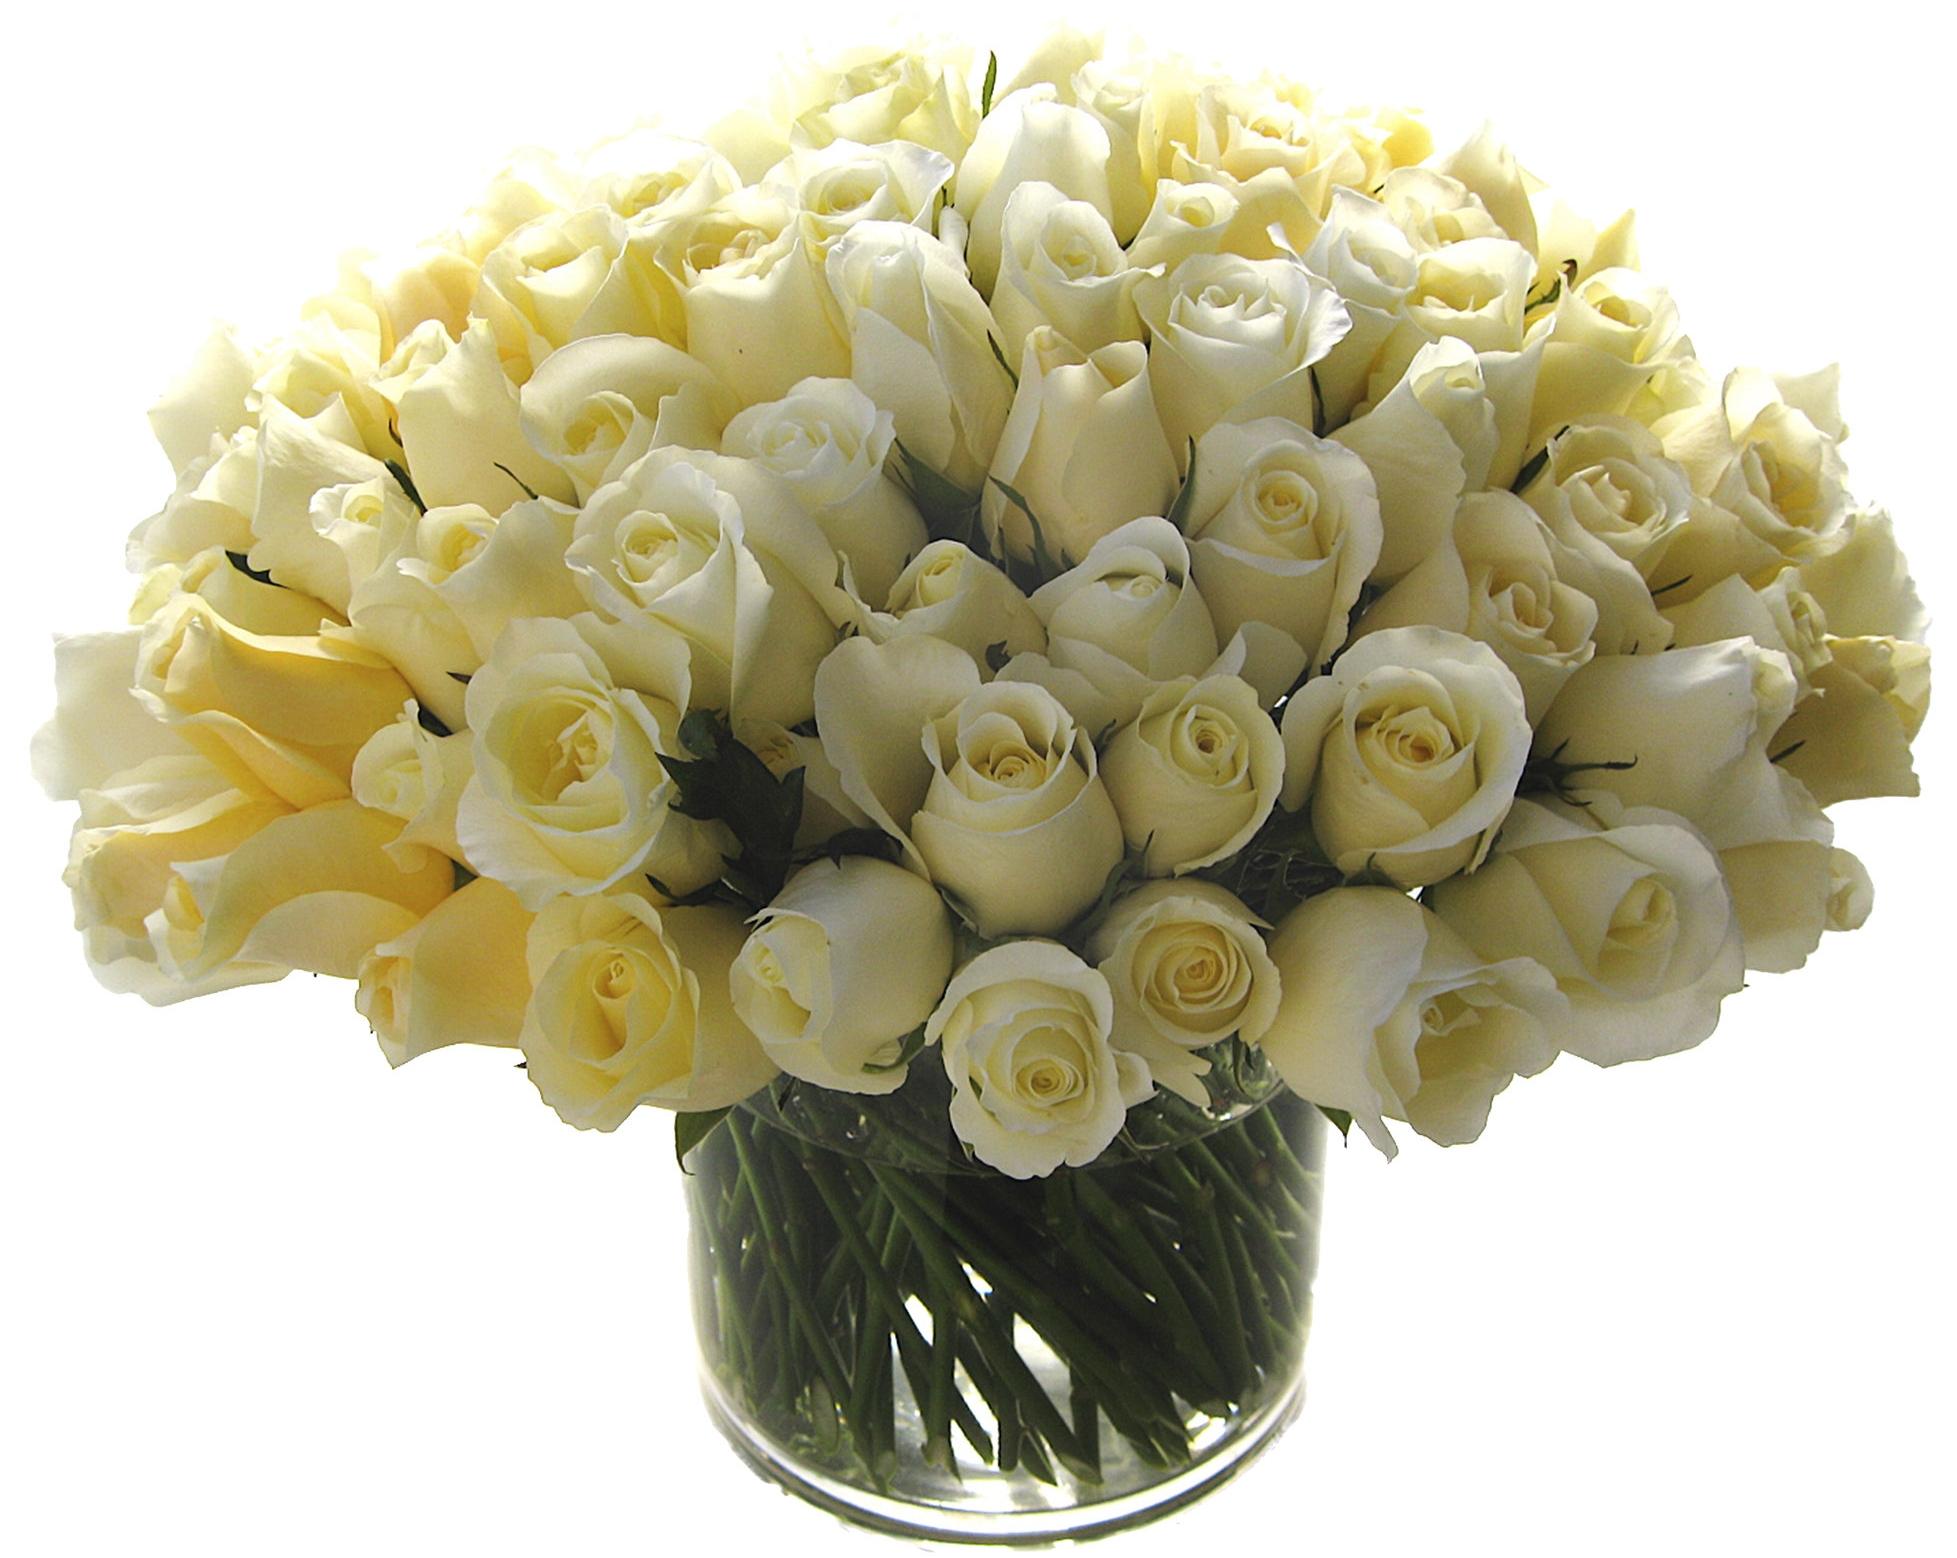 Butter Roses start at $150